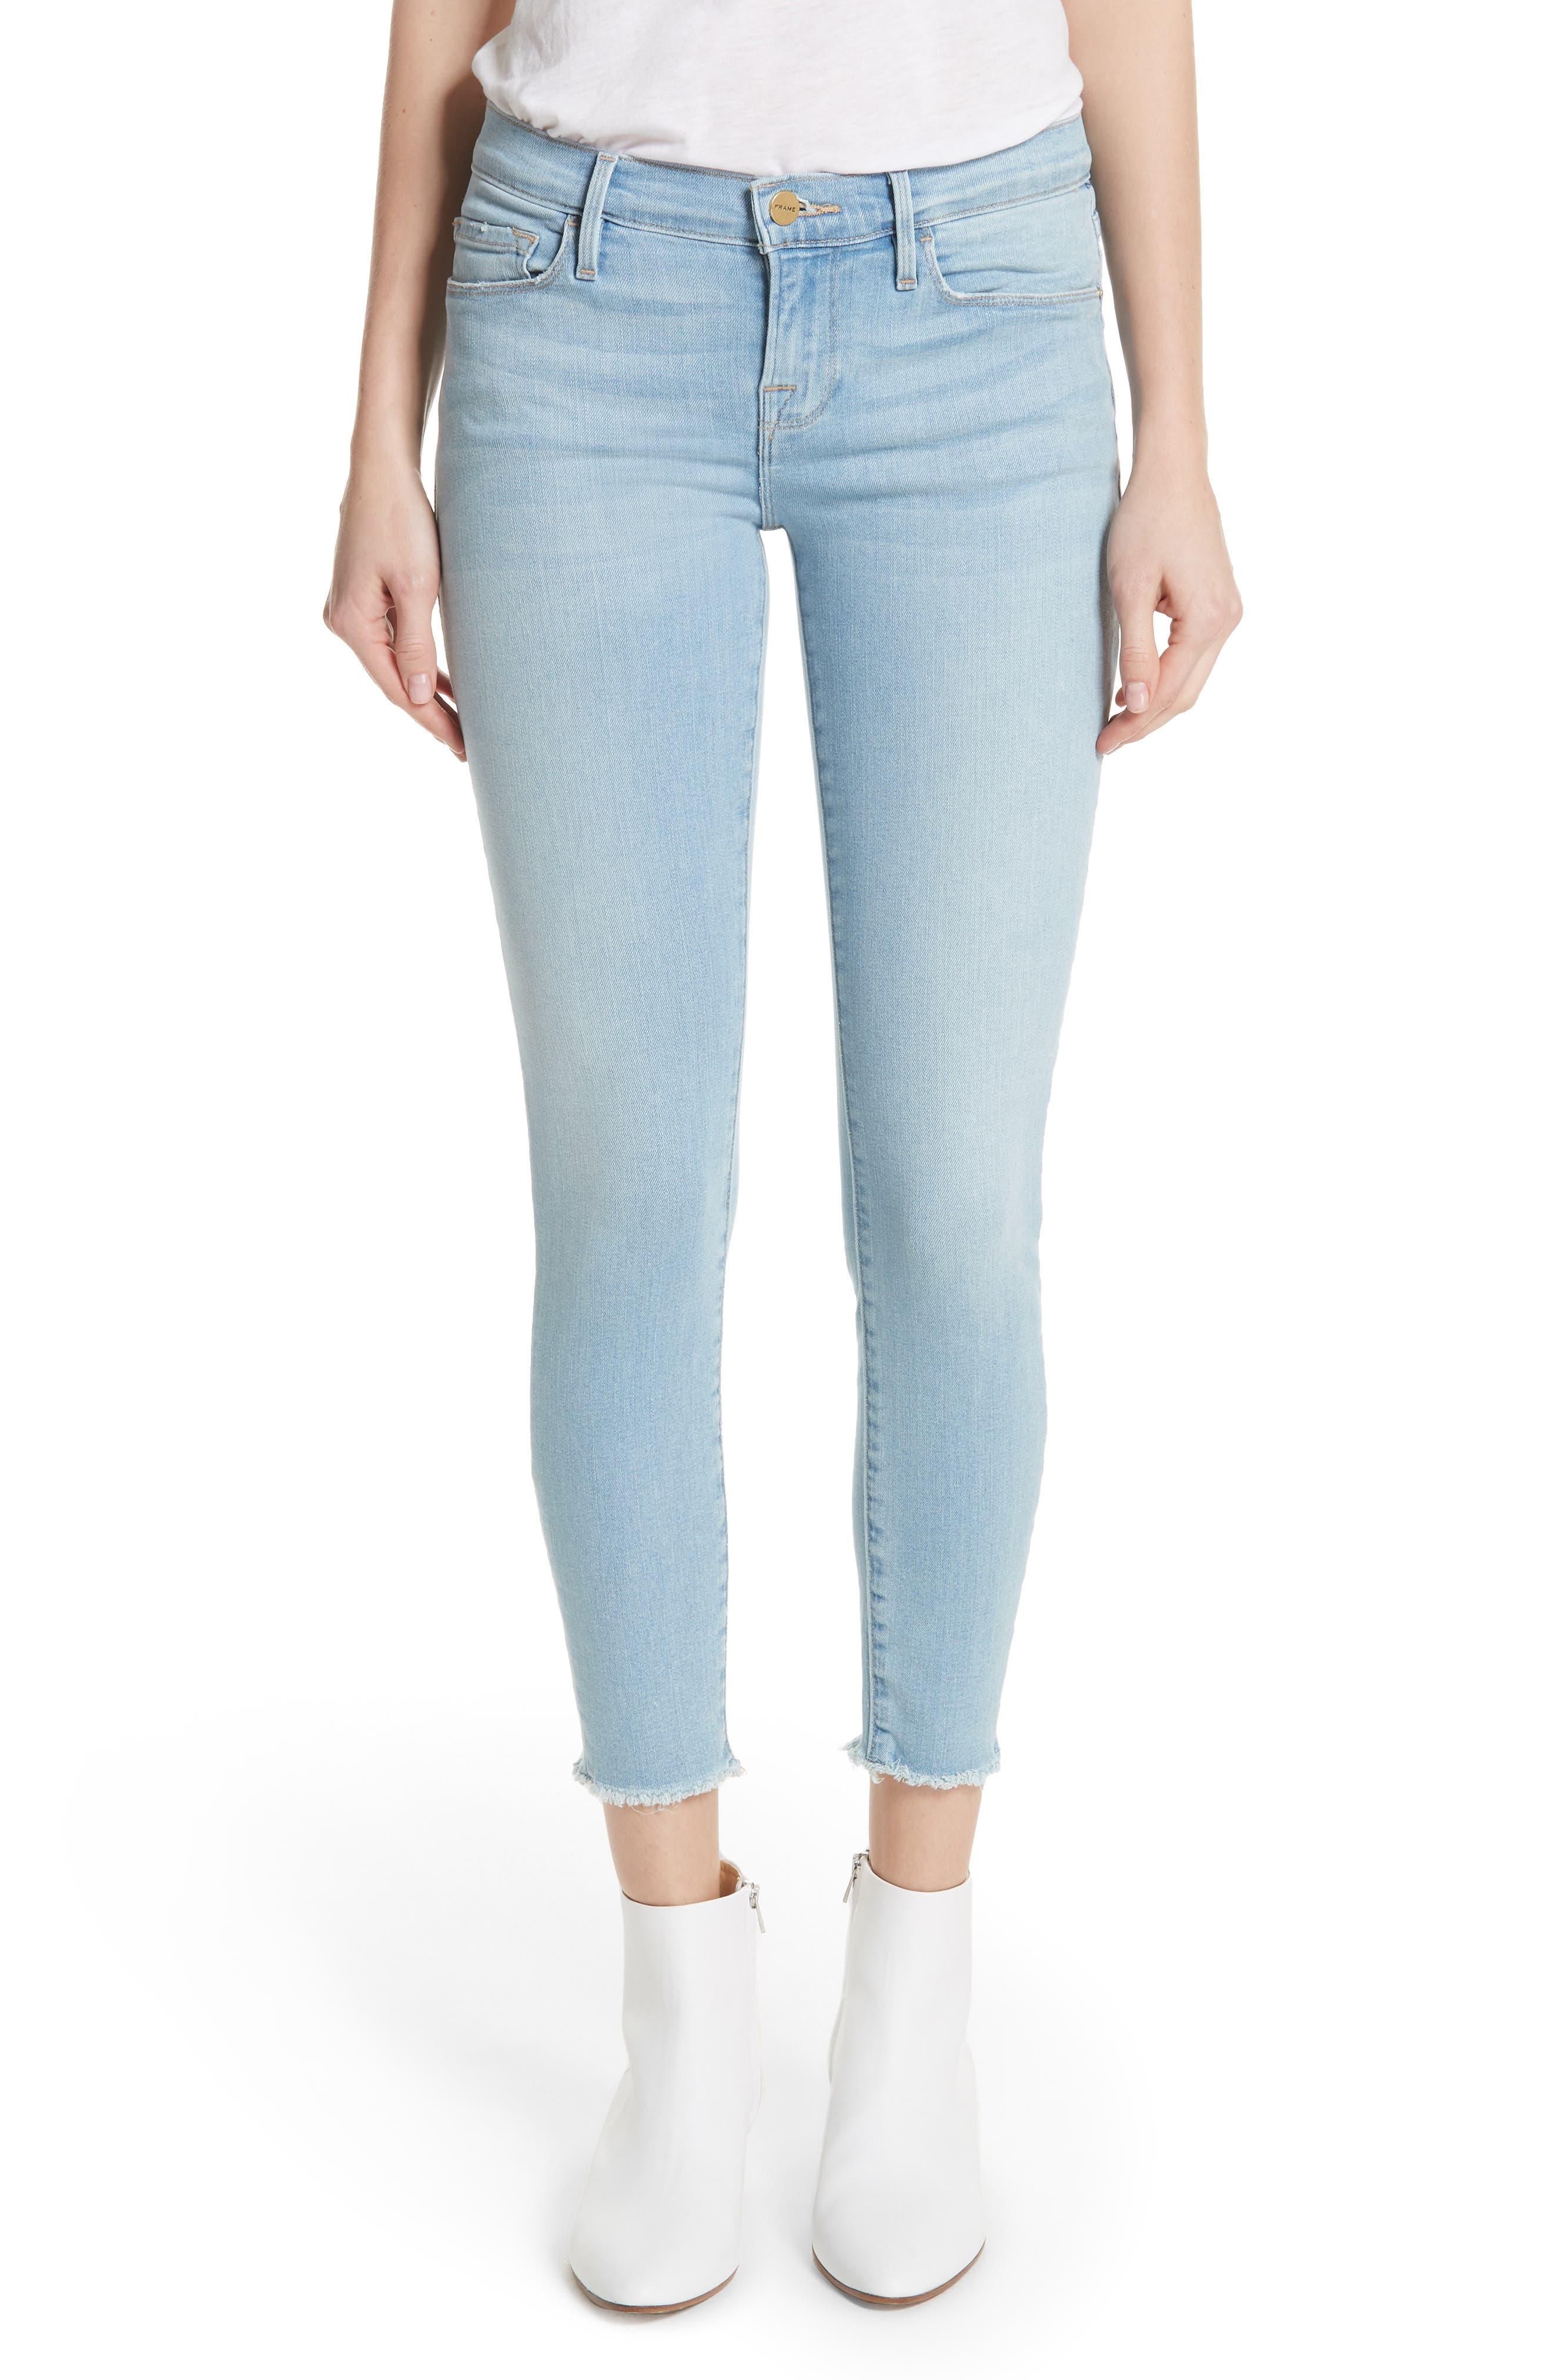 Alternate Image 1 Selected - FRAME Le Skinny de Jeanne Raw Hem Crop Skinny Jeans (Jerome)